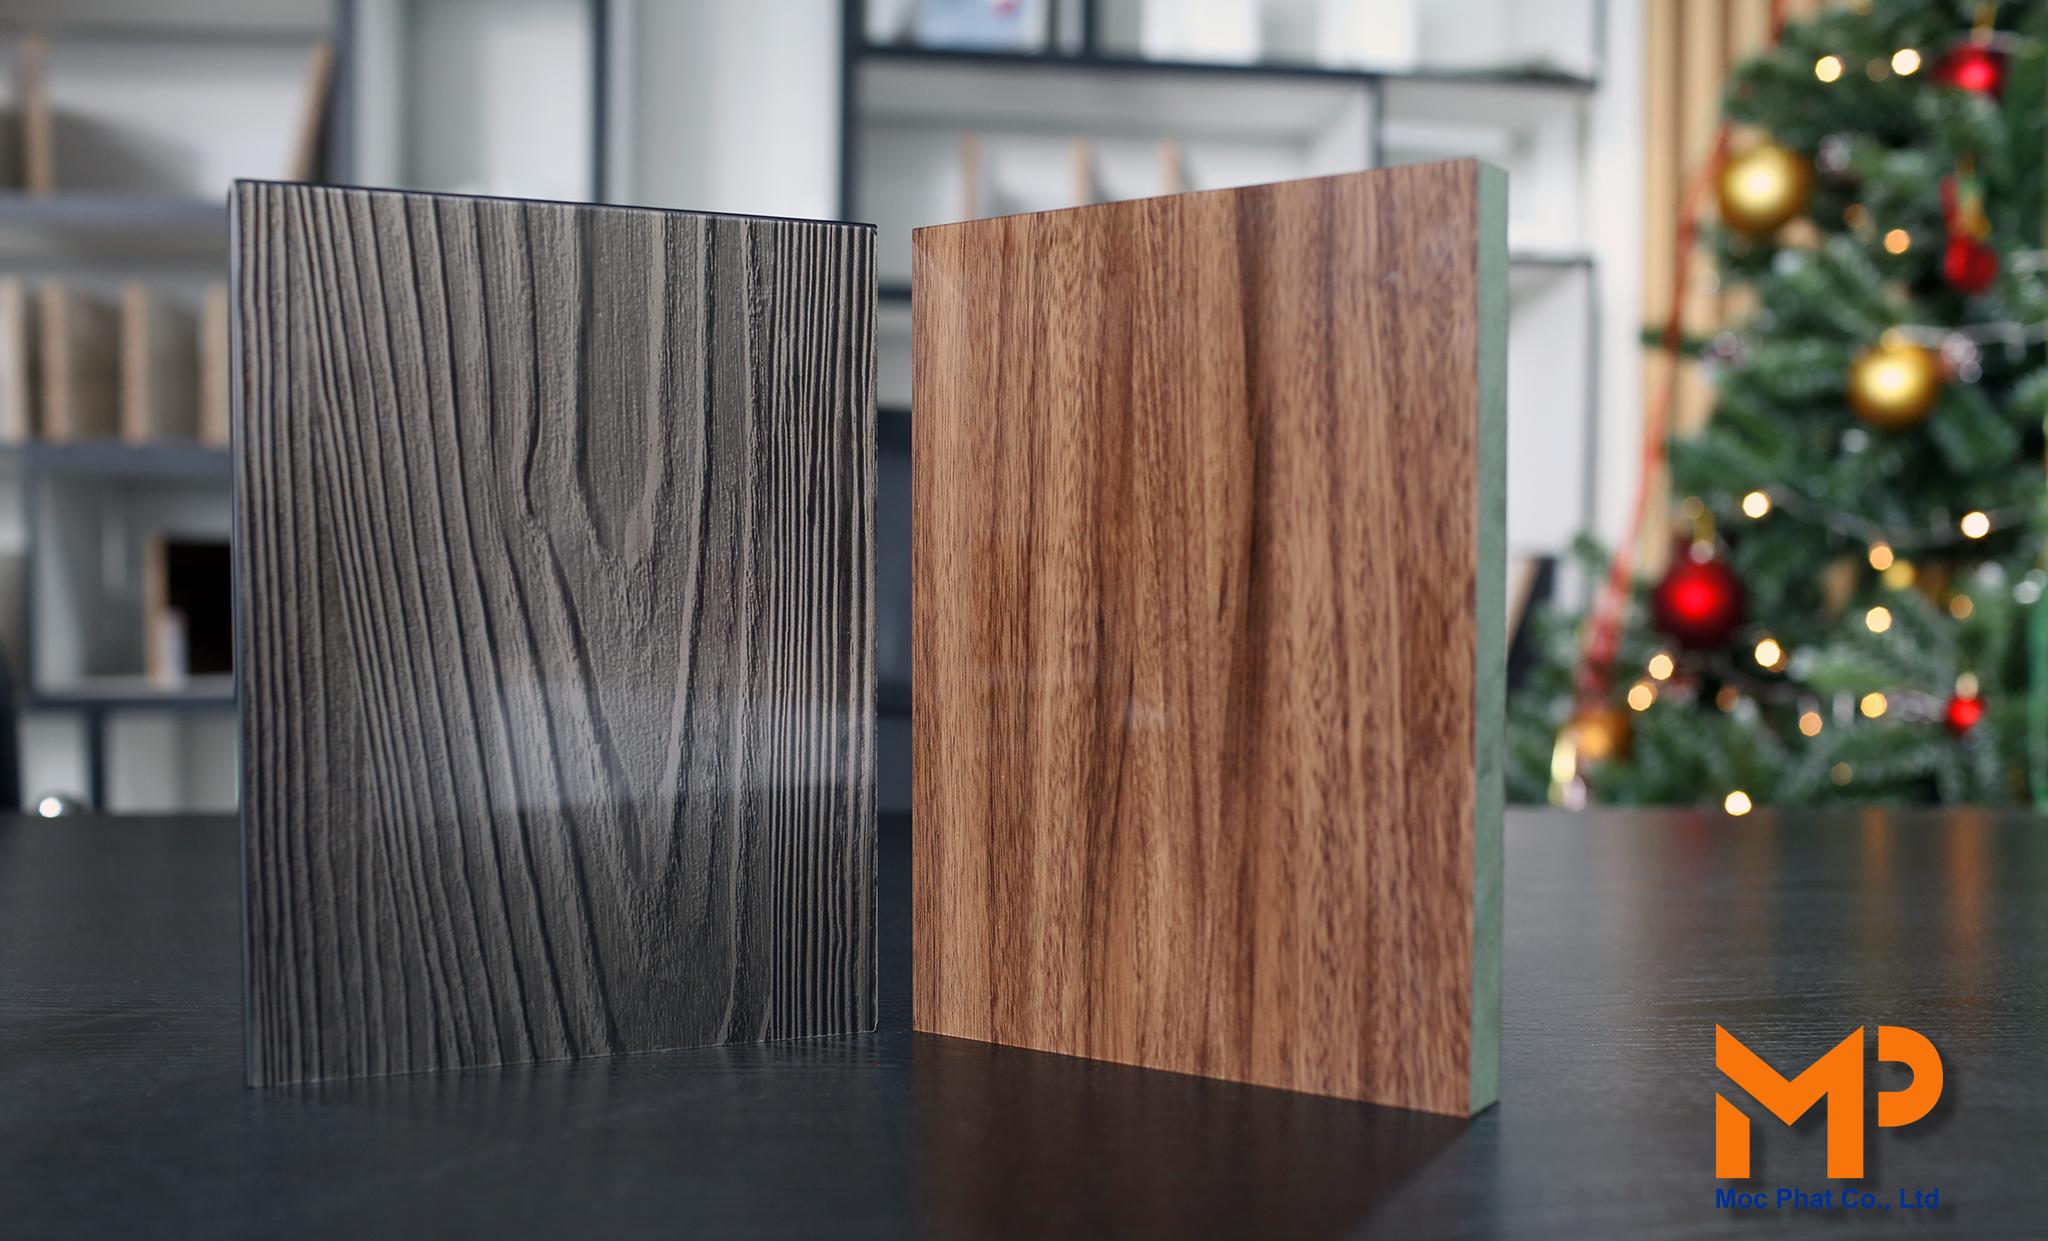 Acrylic vân gỗ gam trầm: Nét quý phái đầy tinh tế